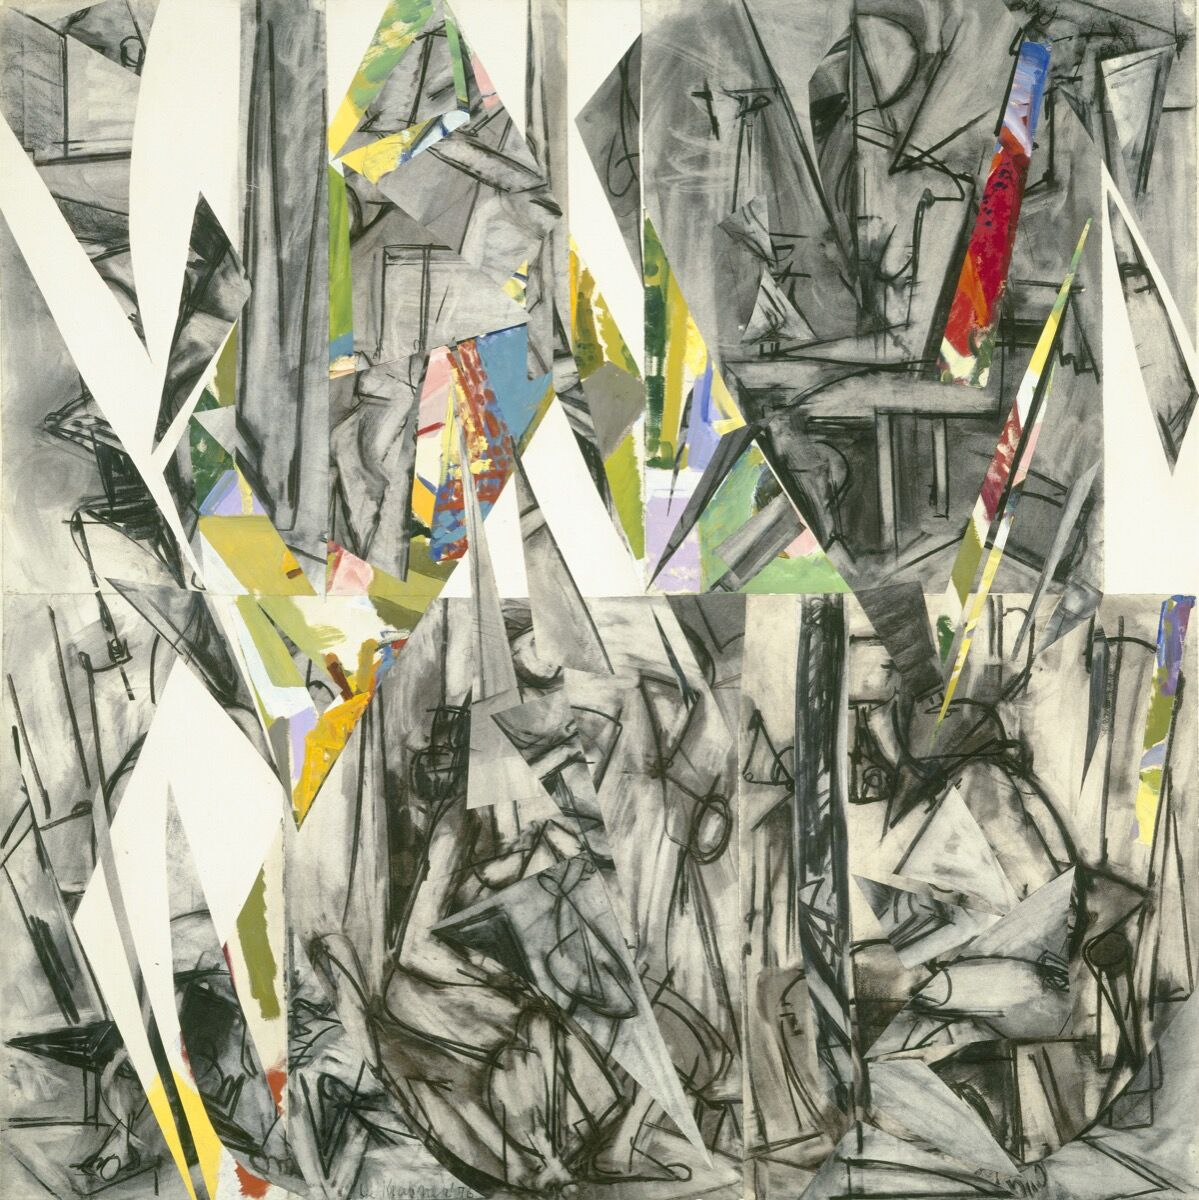 Lee Krasner,  Imperative  , 1976. © The Pollock-Krasner Foundation. Courtesy of the National Gallery of Art, Washington D.C.